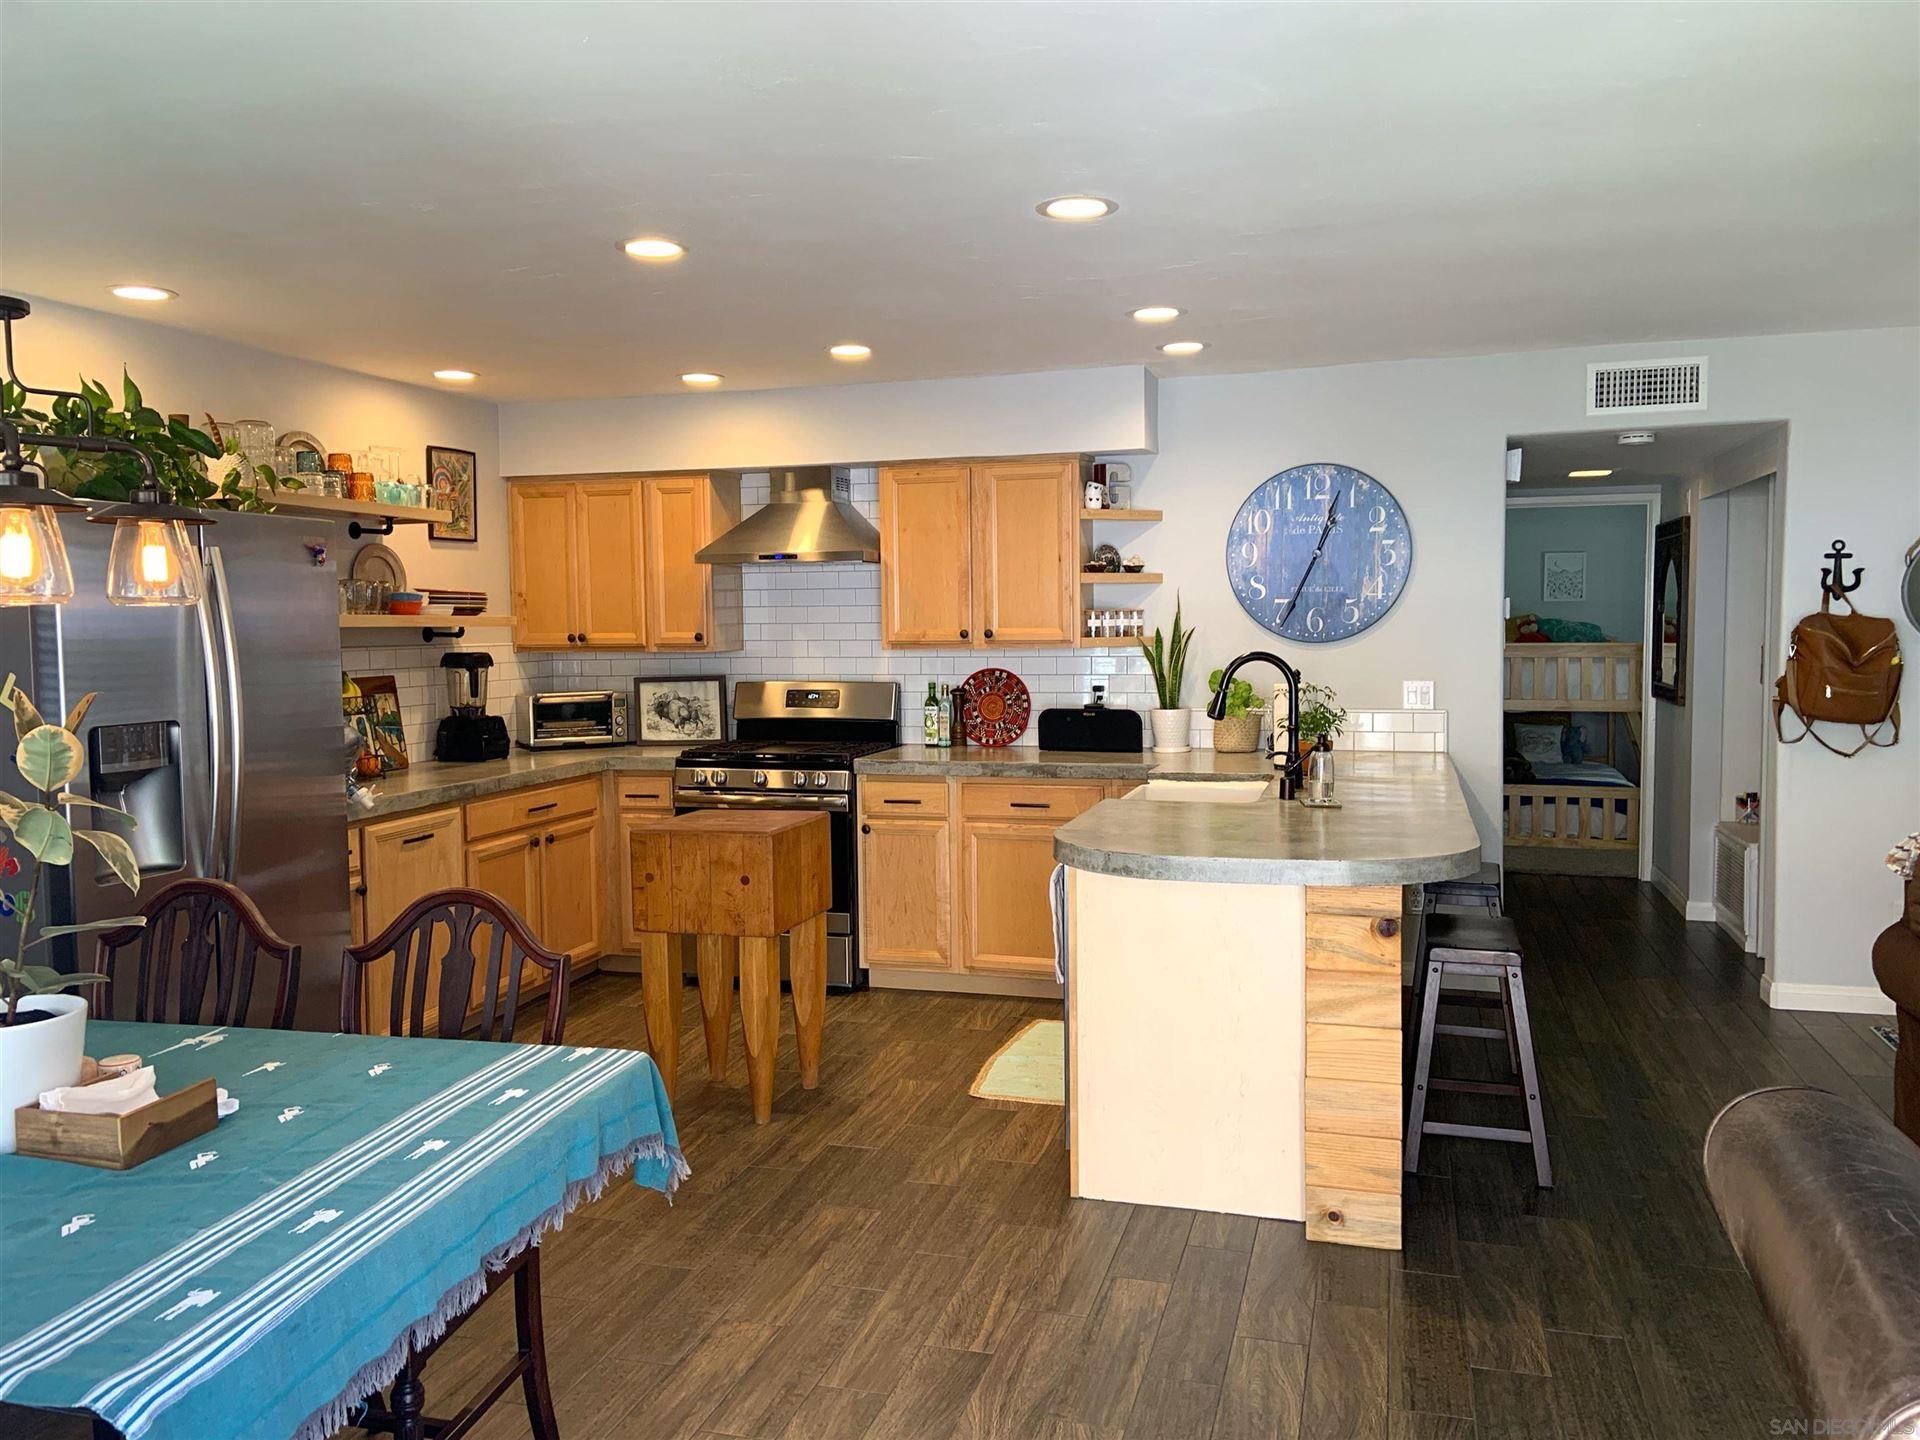 Photo of 2611 Via Eco, Carlsbad, CA 92010 (MLS # 210026431)